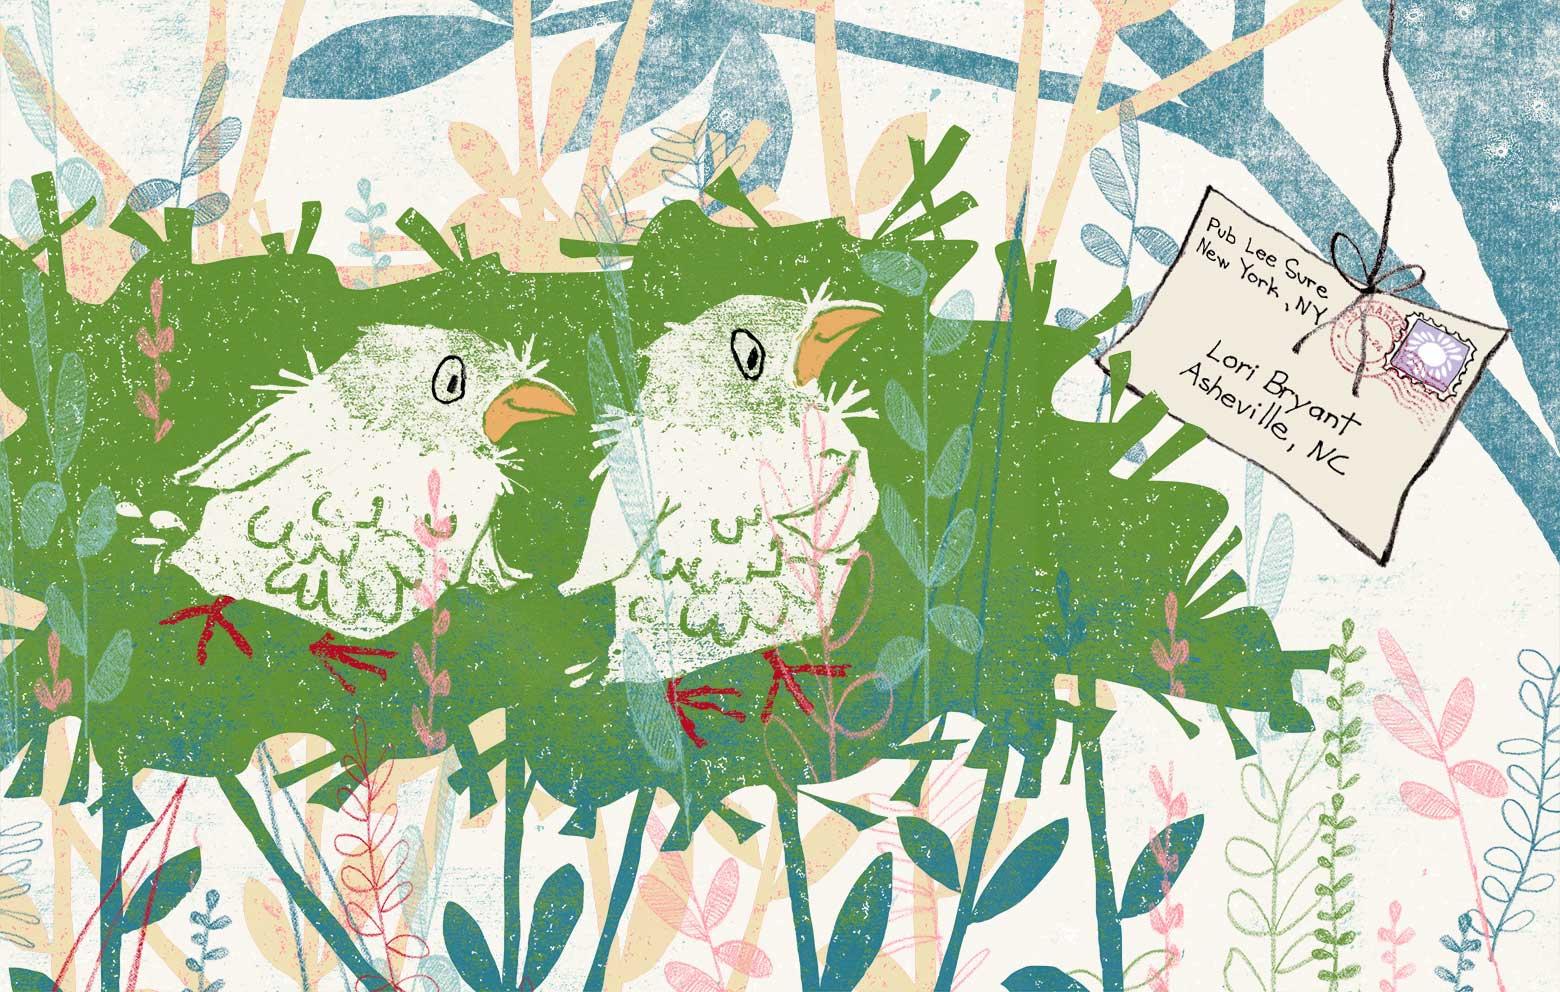 Laura J. Bryant & Lori Bryant illustration of two birds